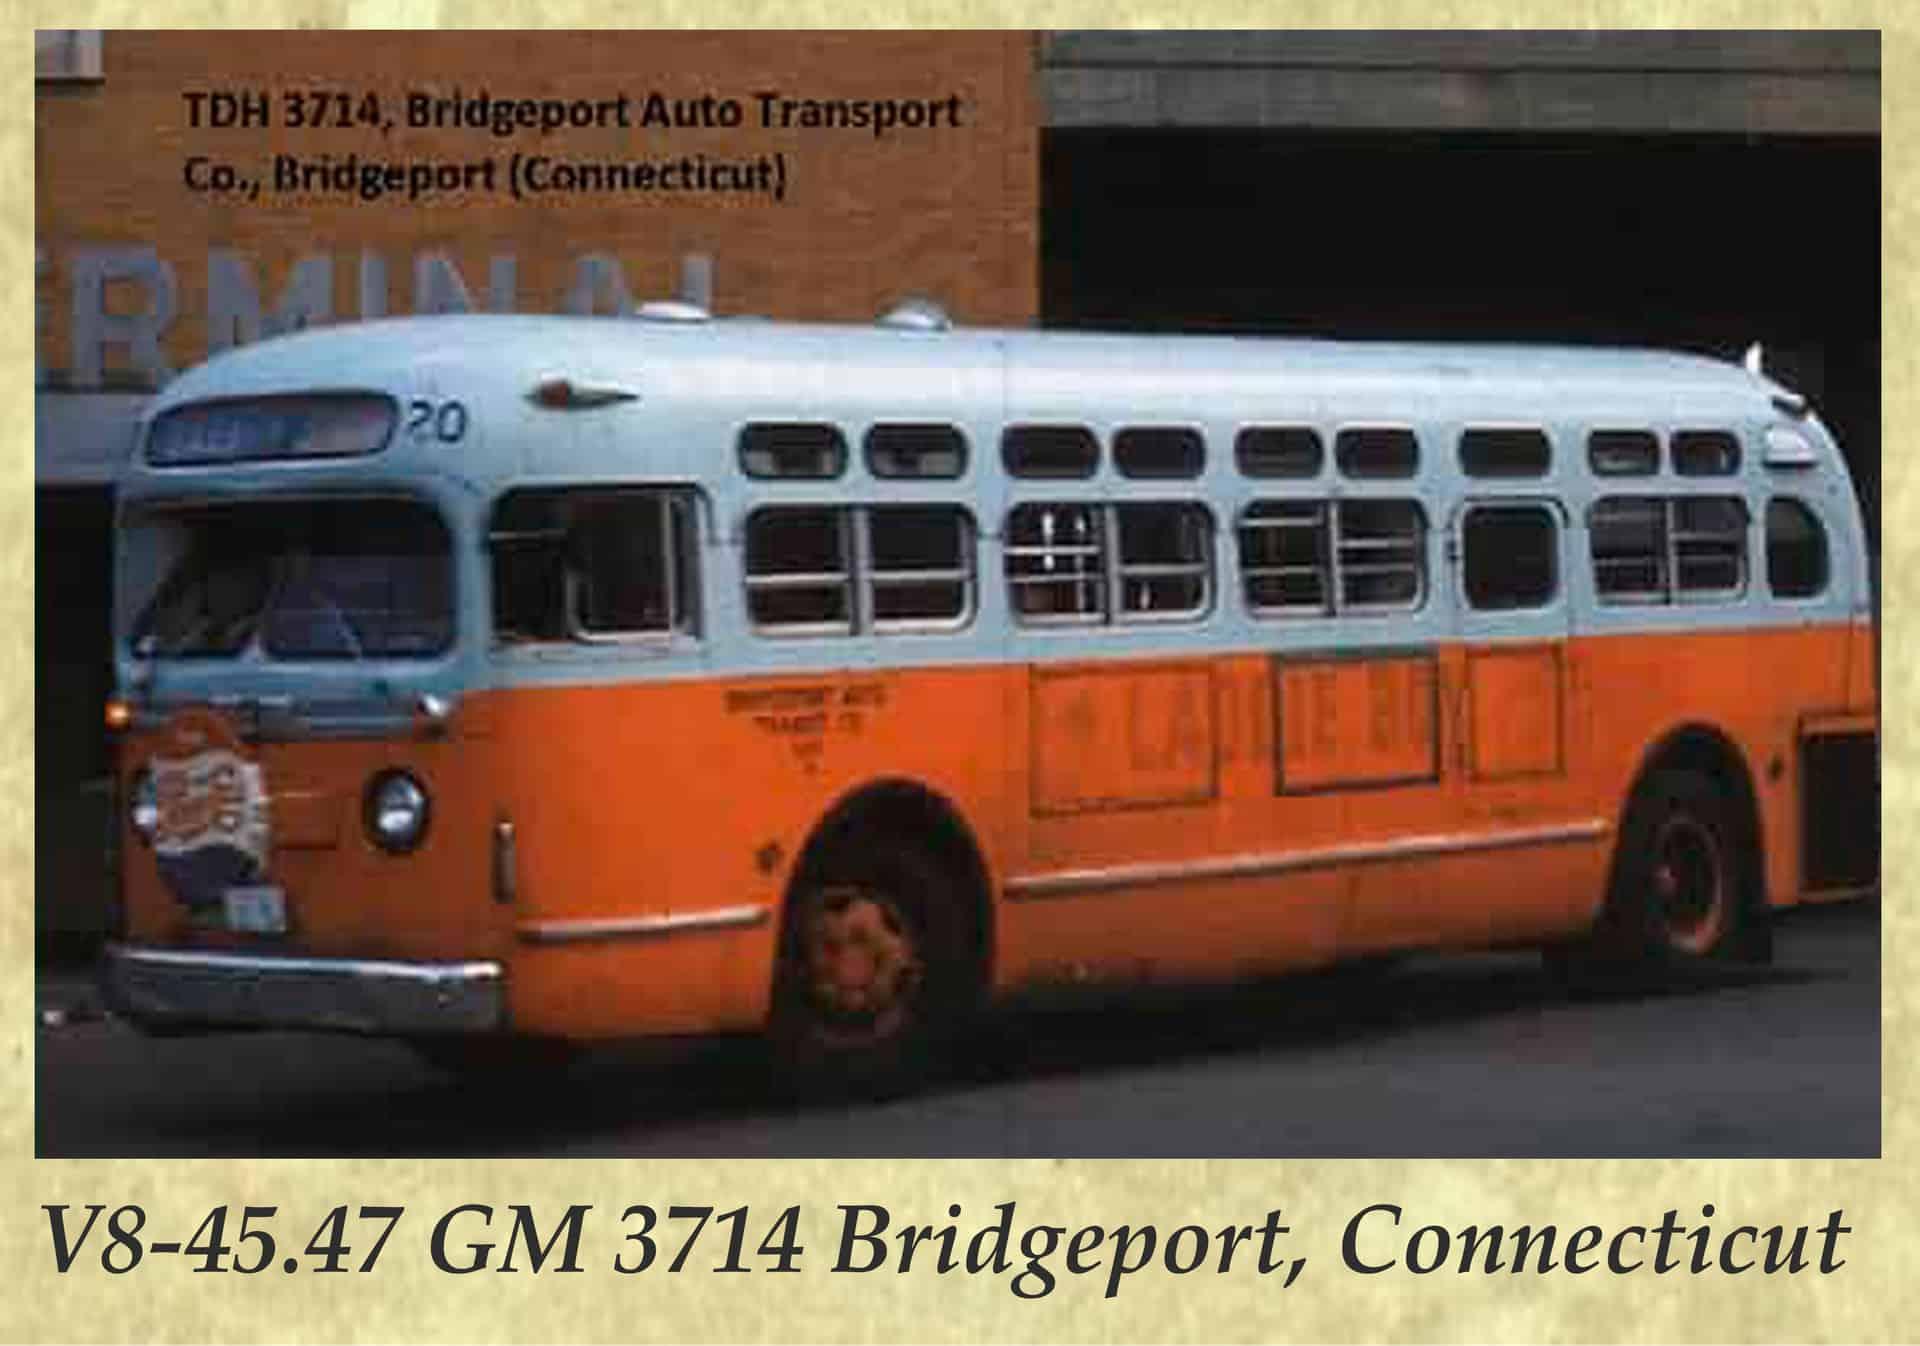 V8-45.47 GM 3714 Bridgeport, Connecticut